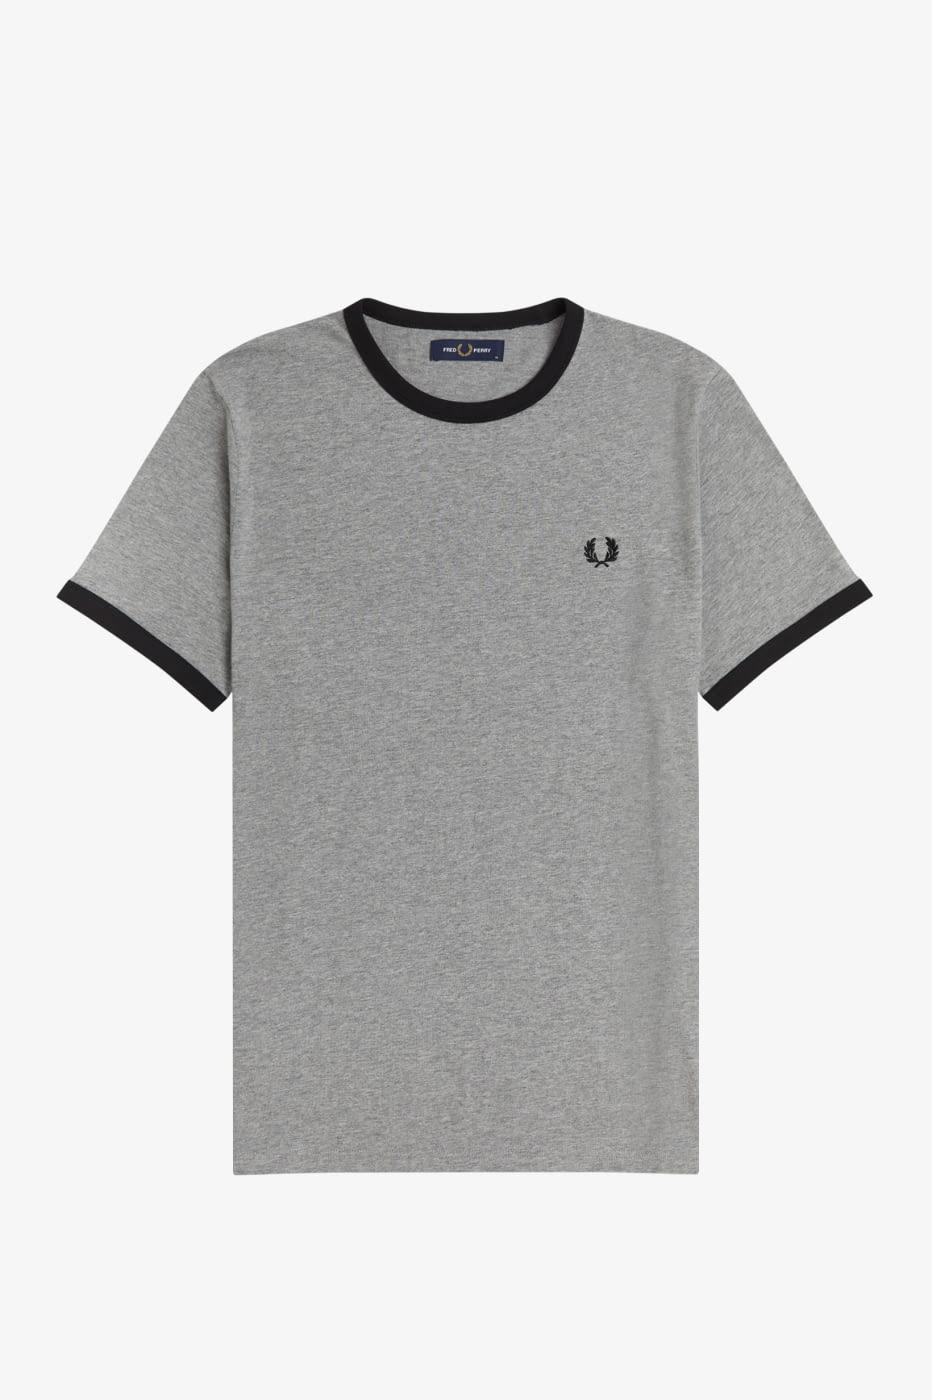 FRED PERRY M3519 Camiseta Ringer